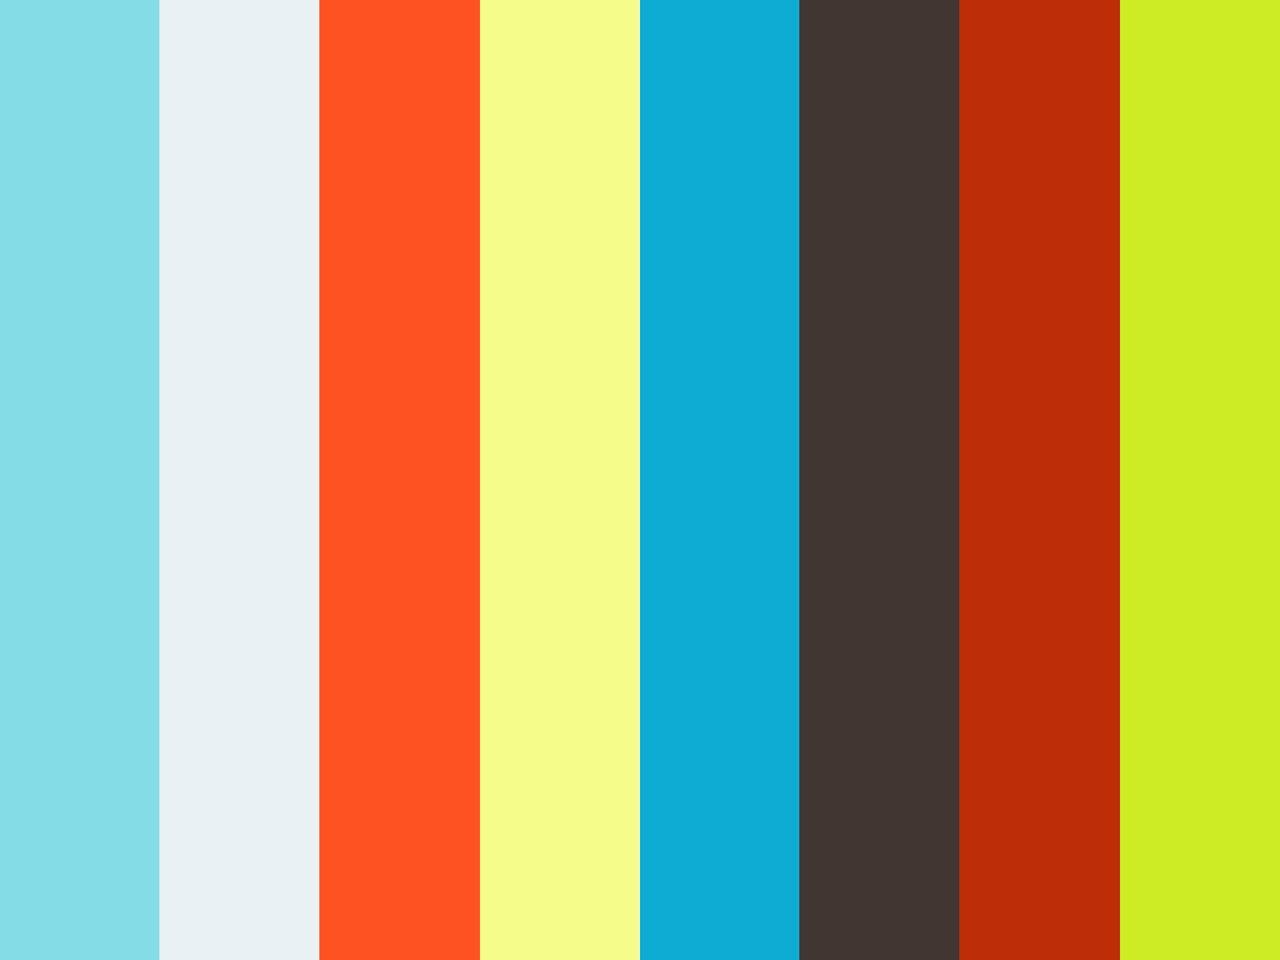 003025 - SNTV - Spreuken in het straatbeeld